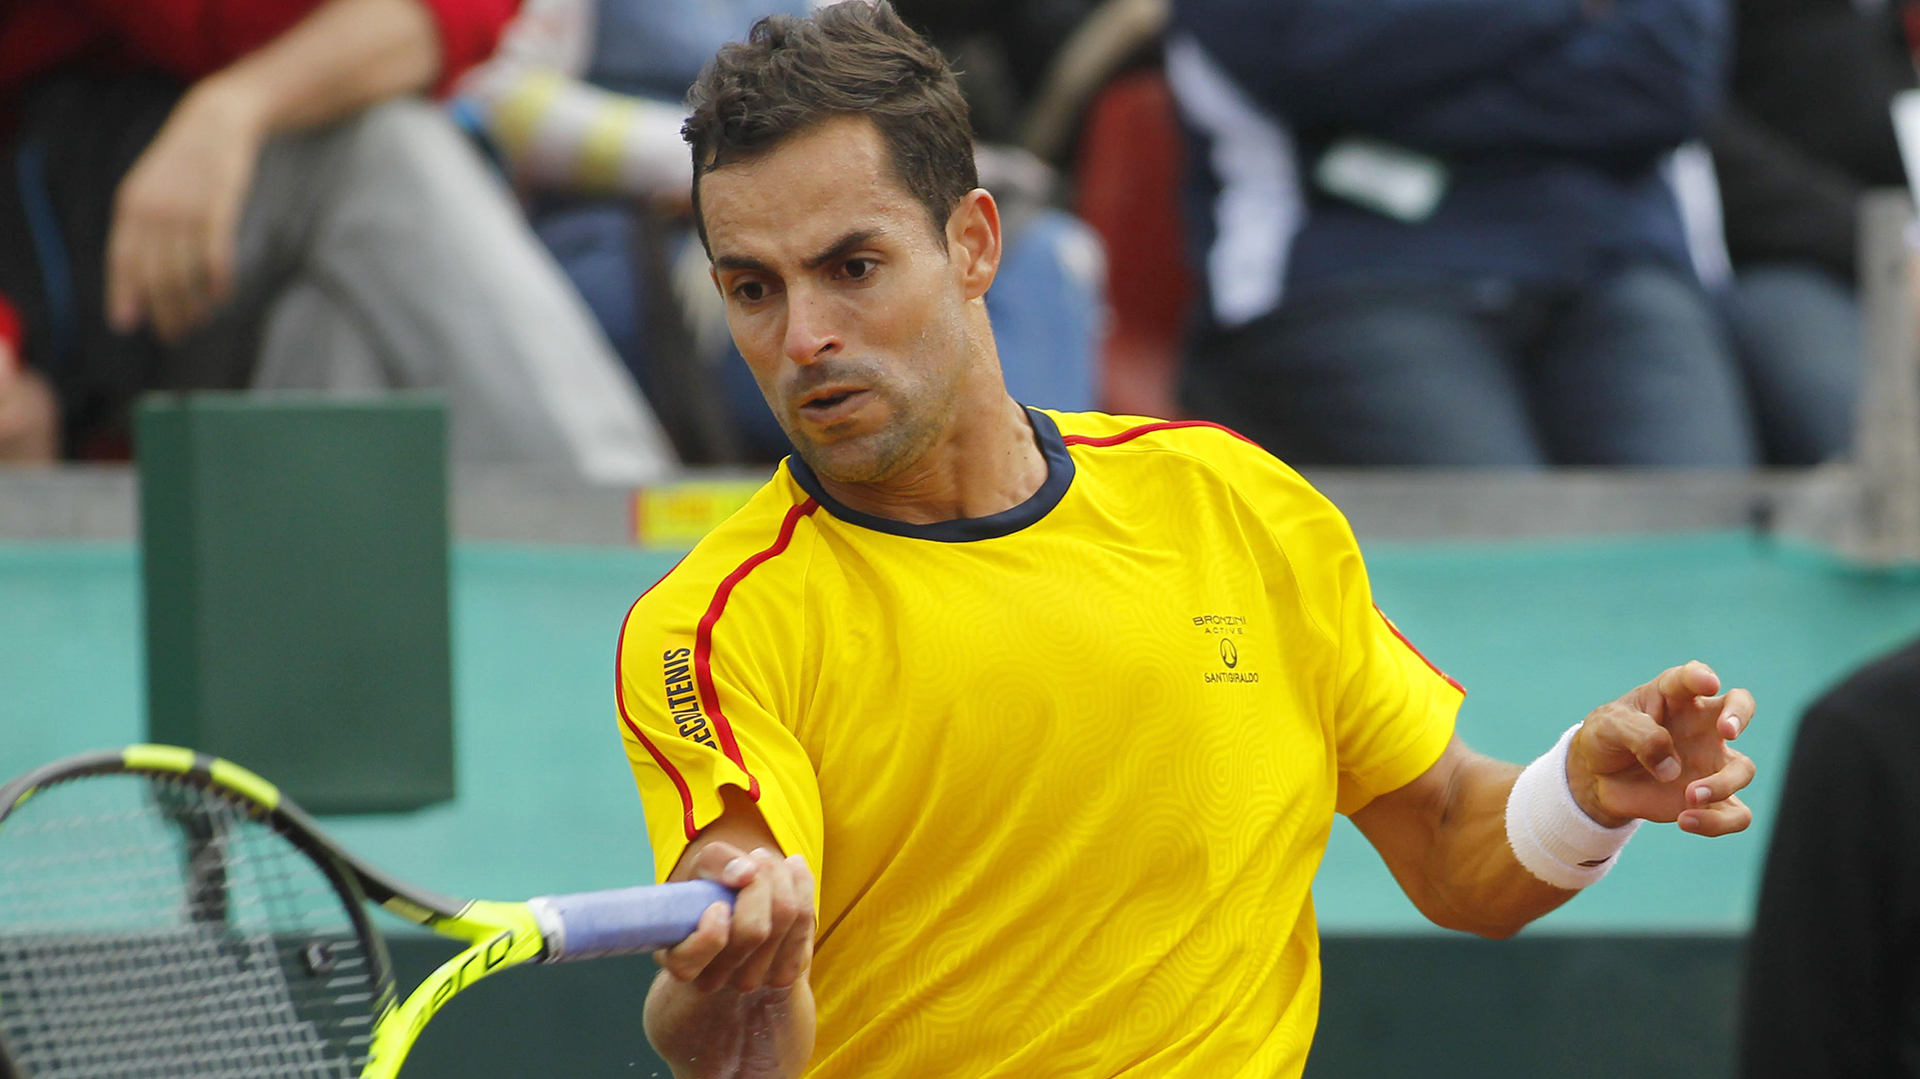 Santiago Giraldo puso punto final a su carrera tenística - Infobae